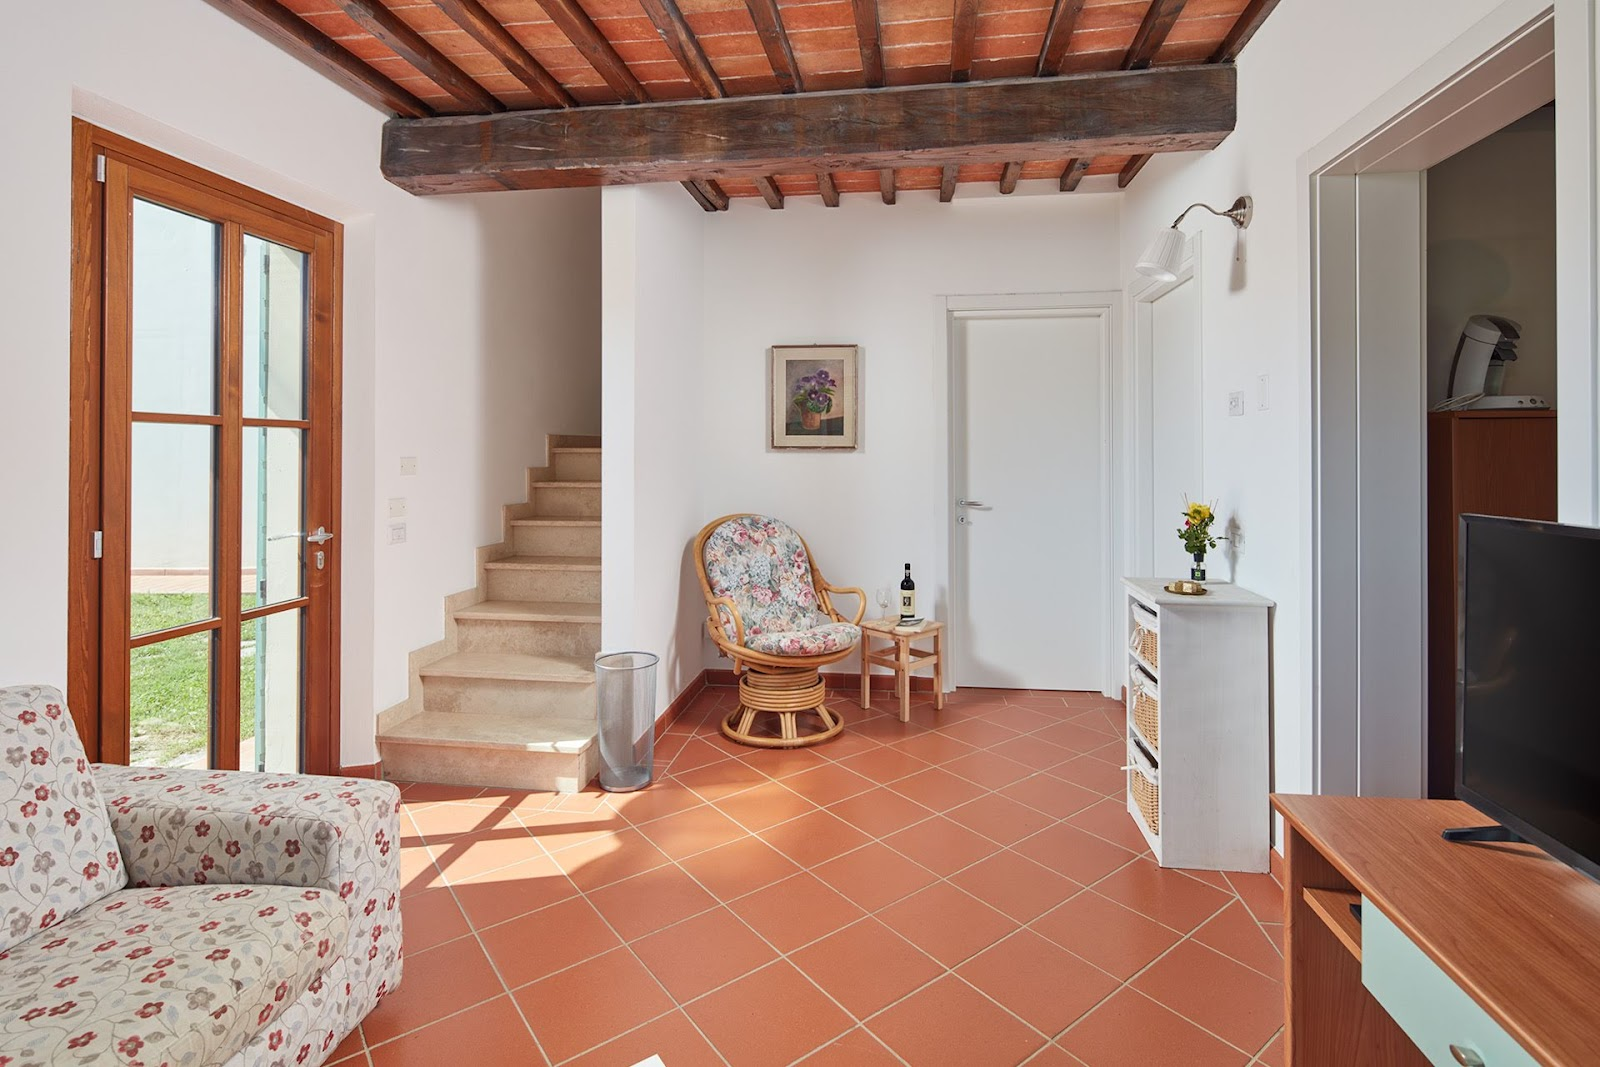 Ferienhaus Corte Paradiso (2570342), Monsummano Terme, Pistoia, Toskana, Italien, Bild 39